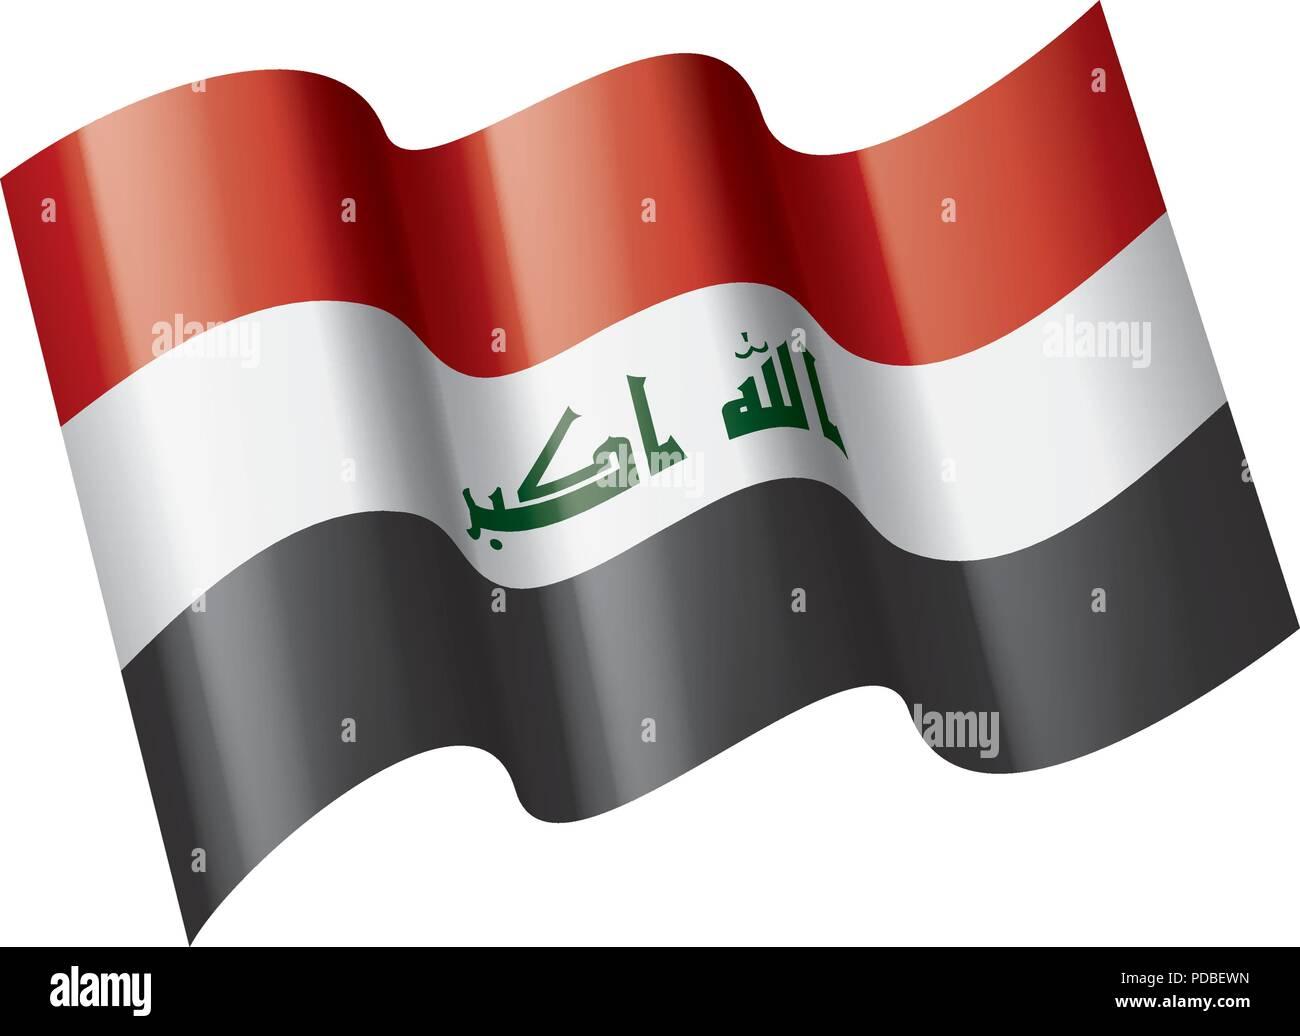 Iraqi flag, vector illustration on a white background - Stock Image